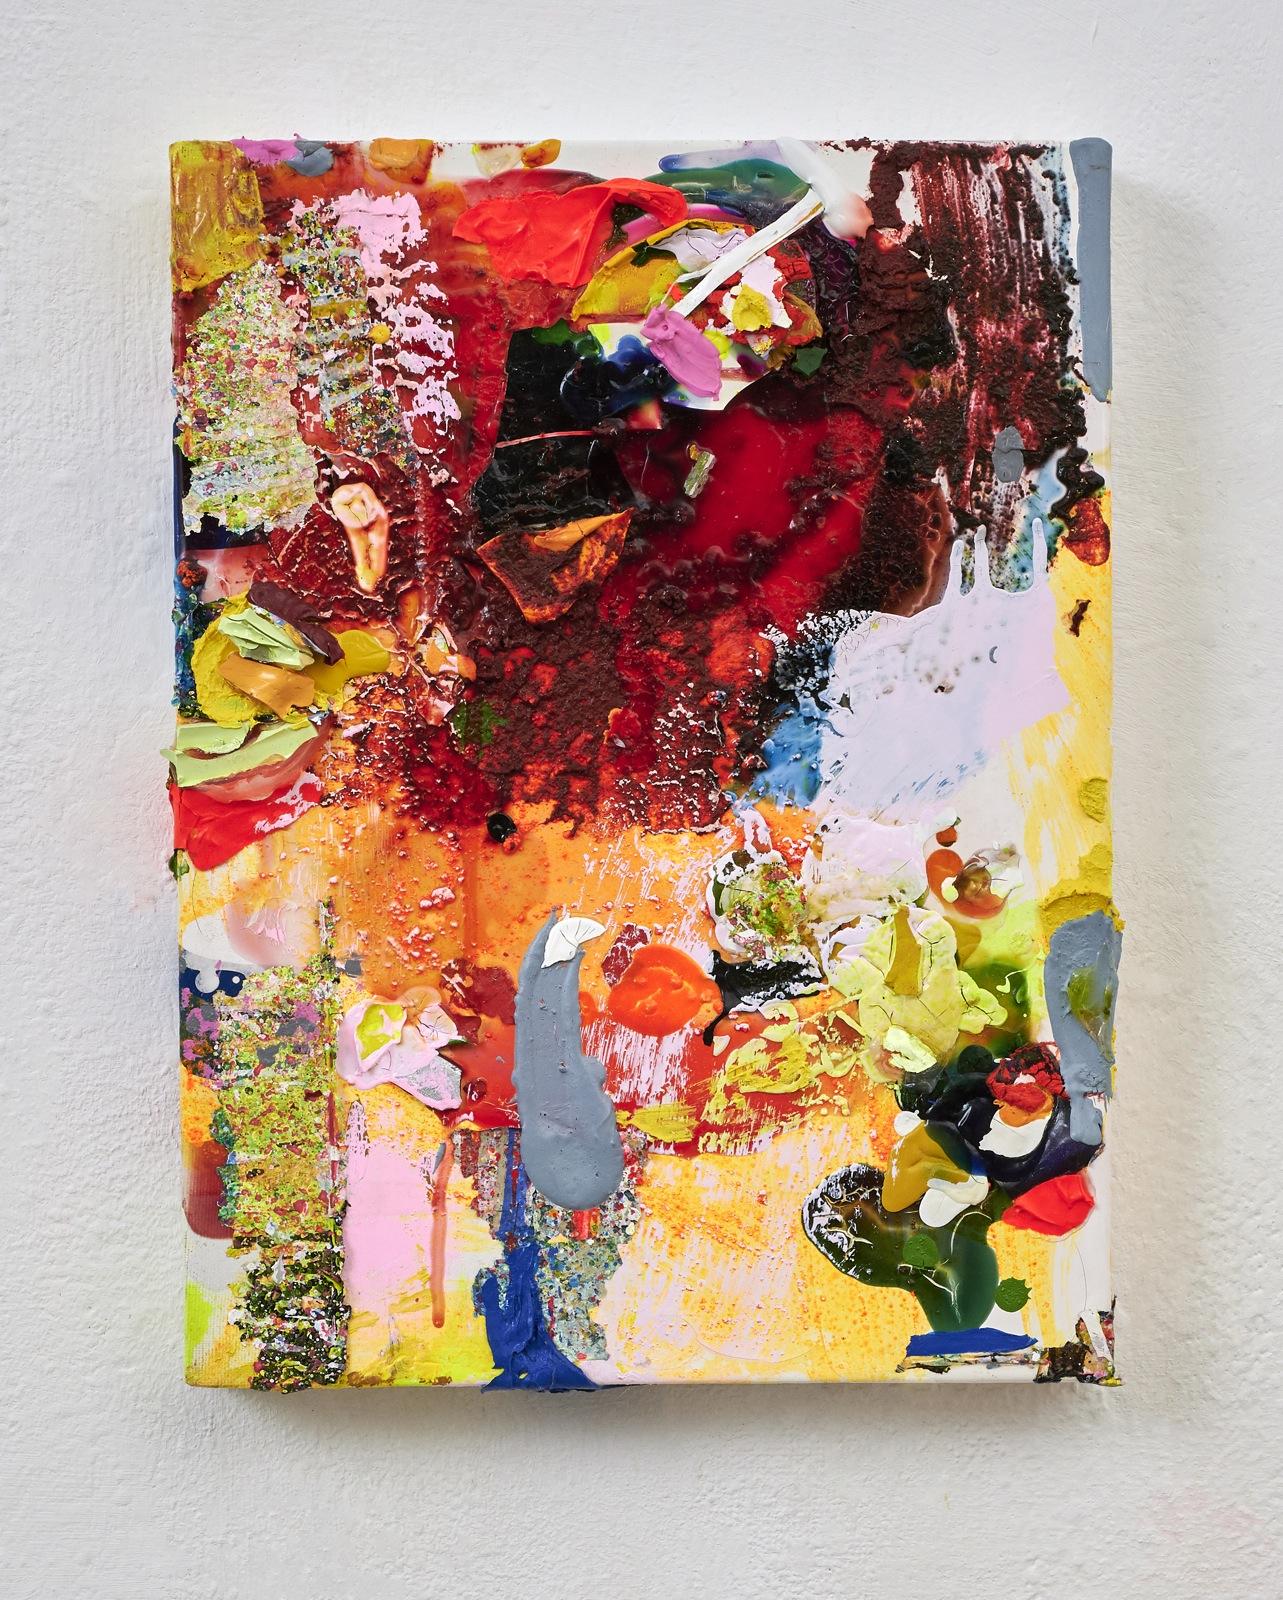 Kopfstück, 40x30 cm, Acrylfarbe, Leinwand, 2019